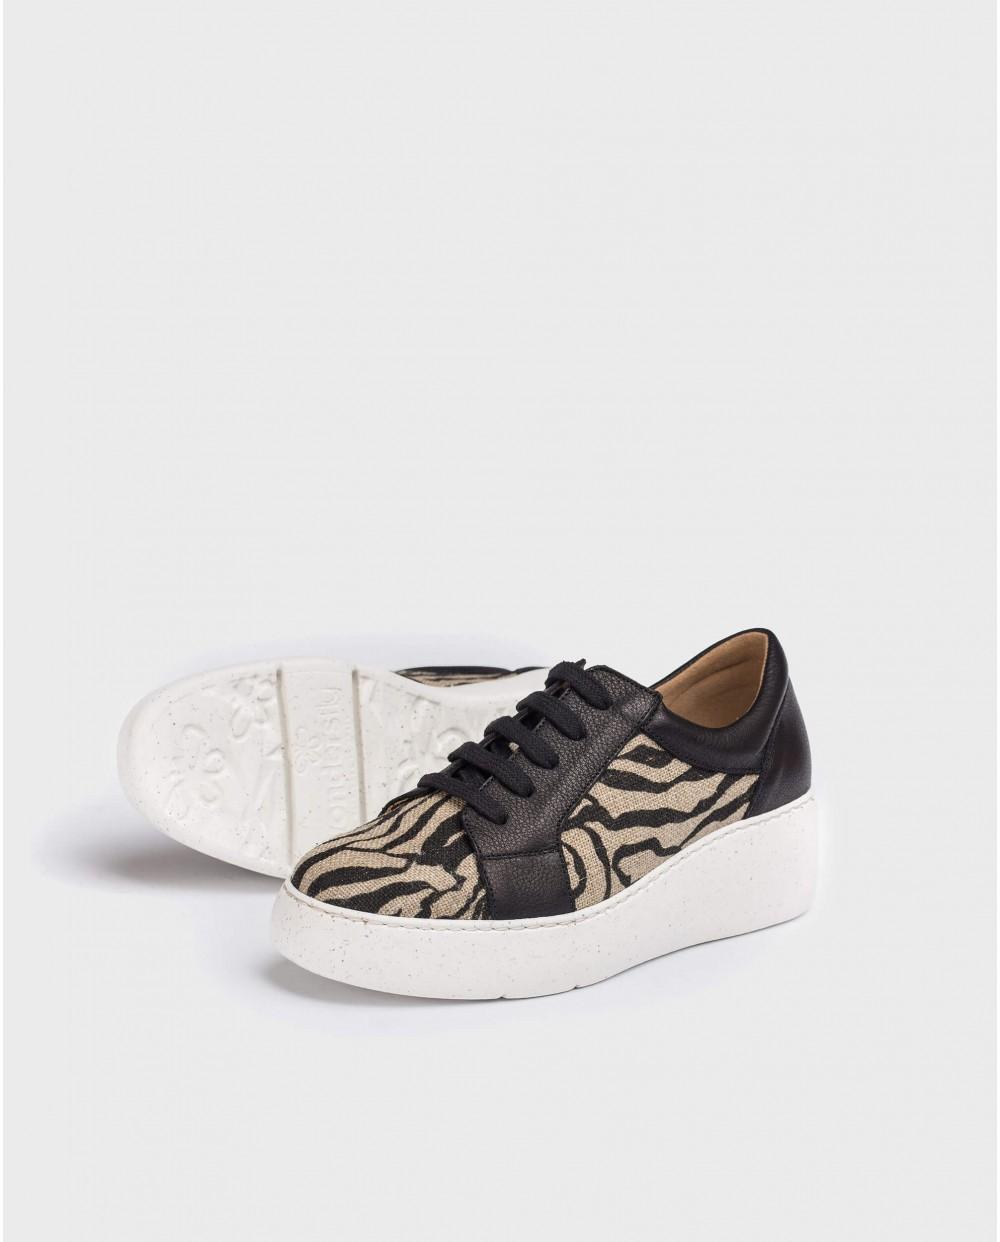 Wonders-Flat Shoes-Cairo